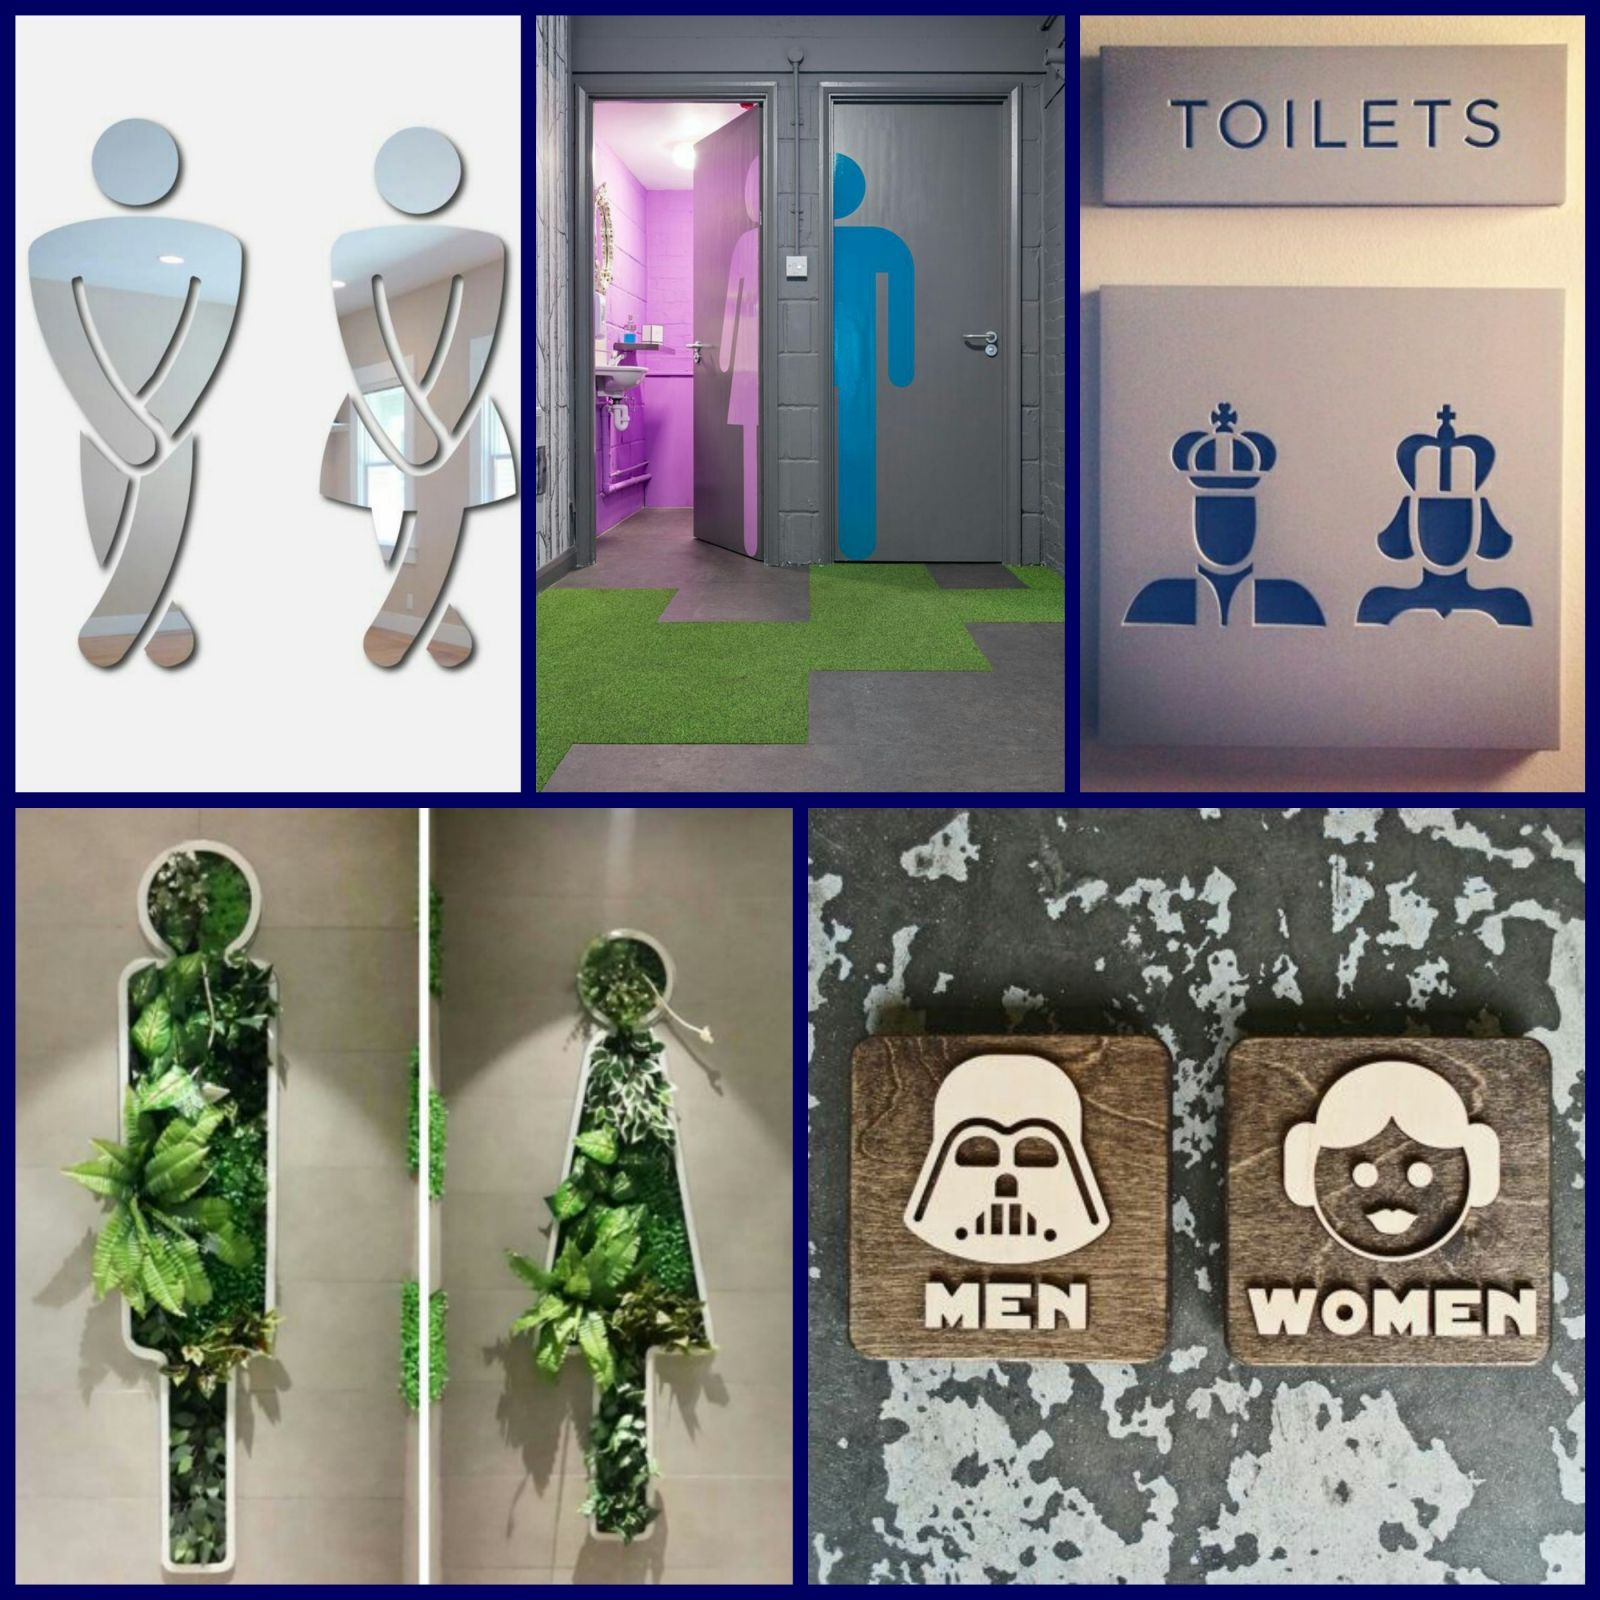 Funny Bathroom Signs Restroom Restroom Signature Wc Signs Restroom Signs Funny Restroom Sign Funny Wc Signs Creative Bathroom Si Dekor Tuvaletler Modern